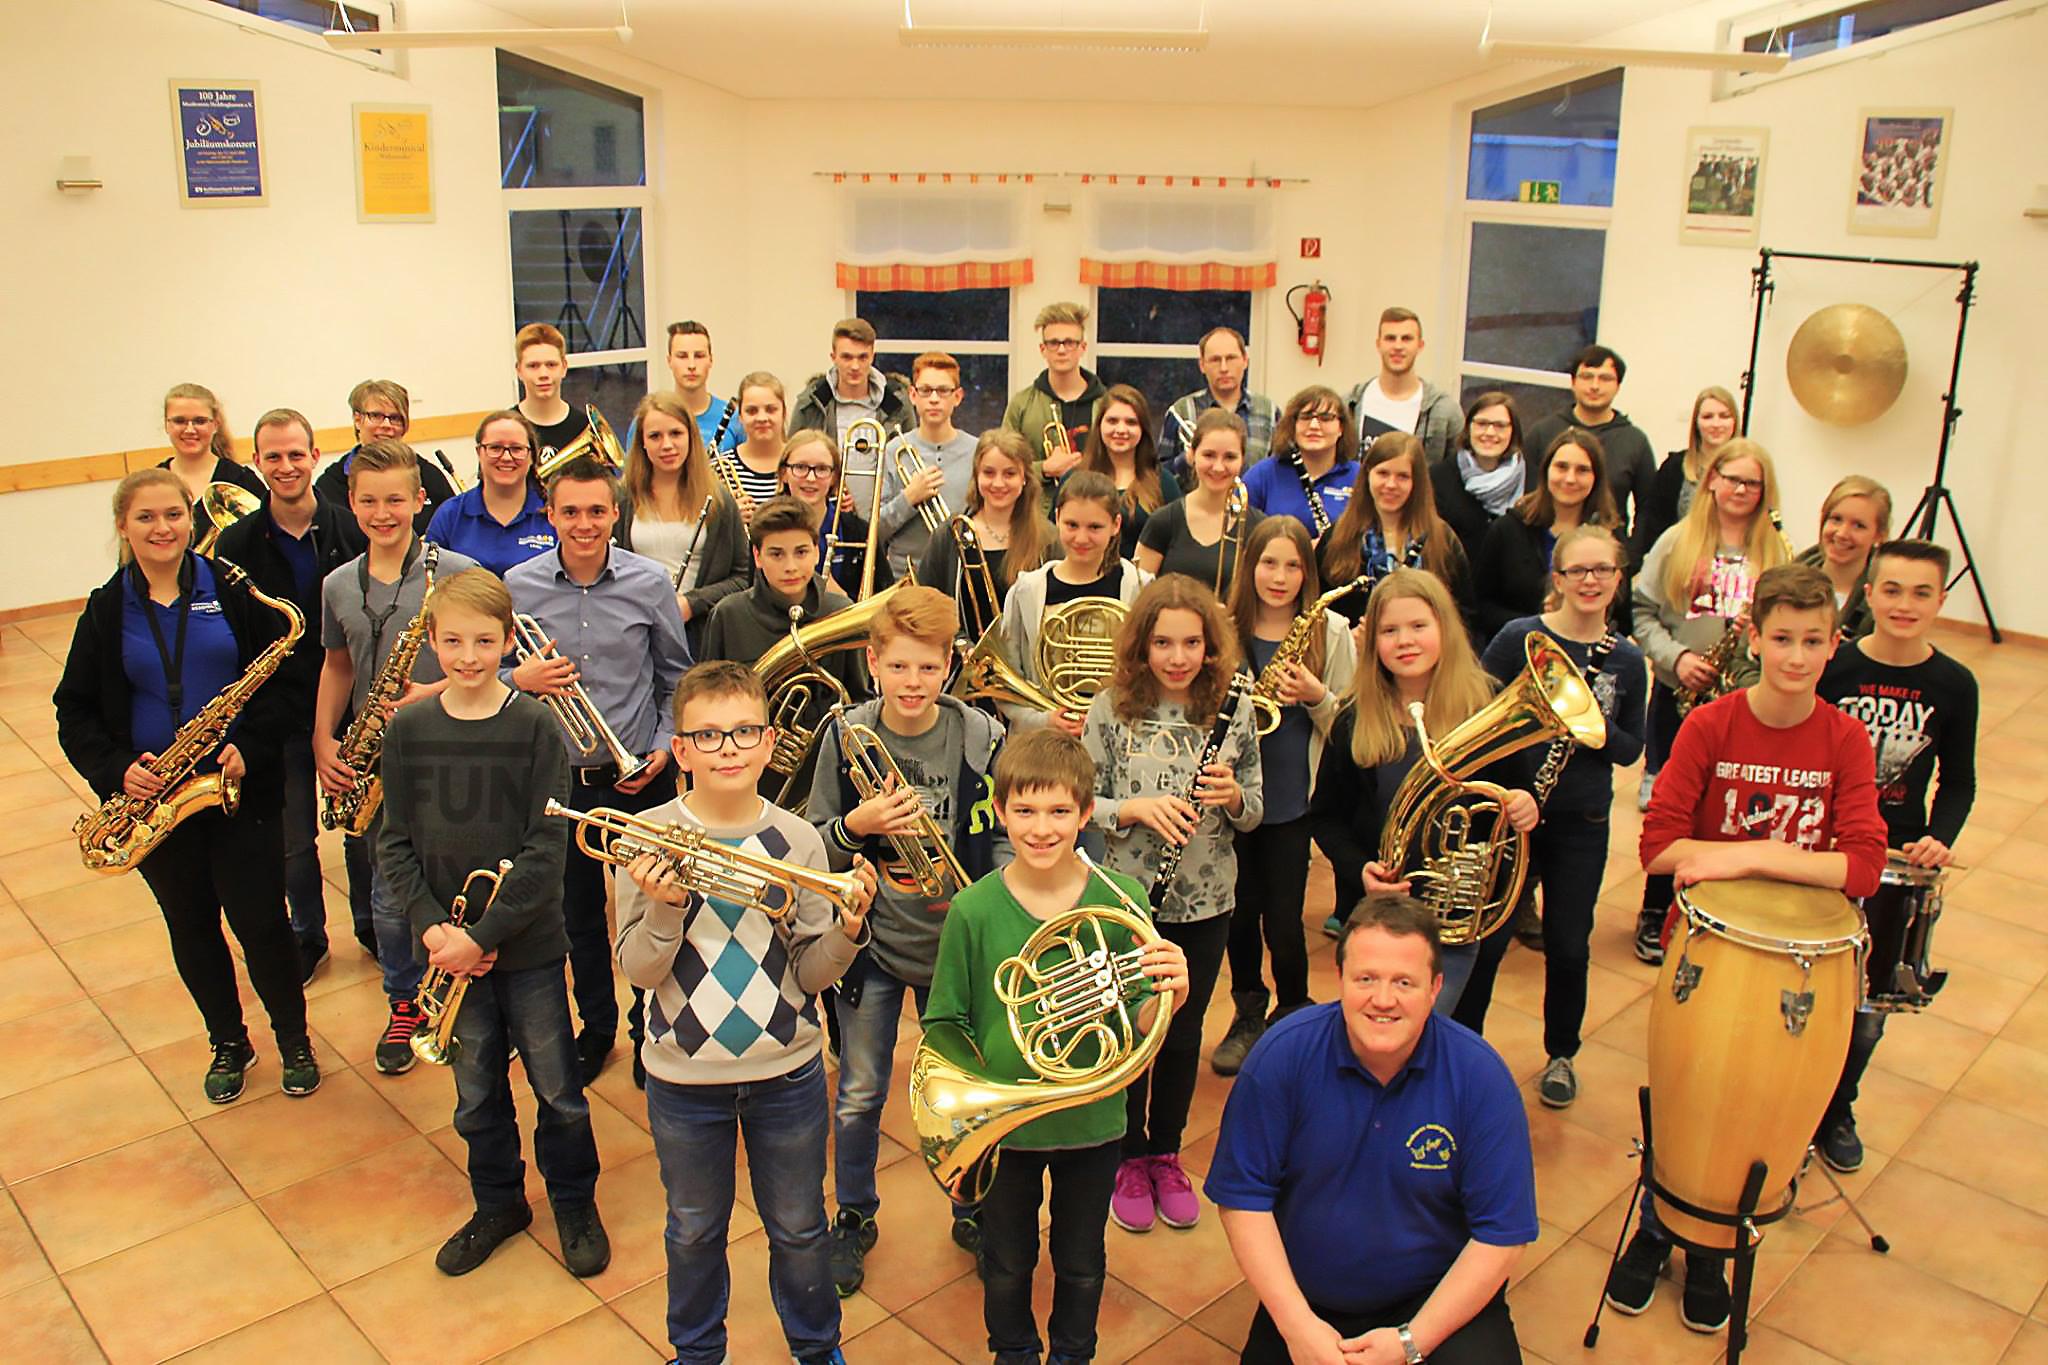 Jugendarbeit - Musikverein Heddinghausen